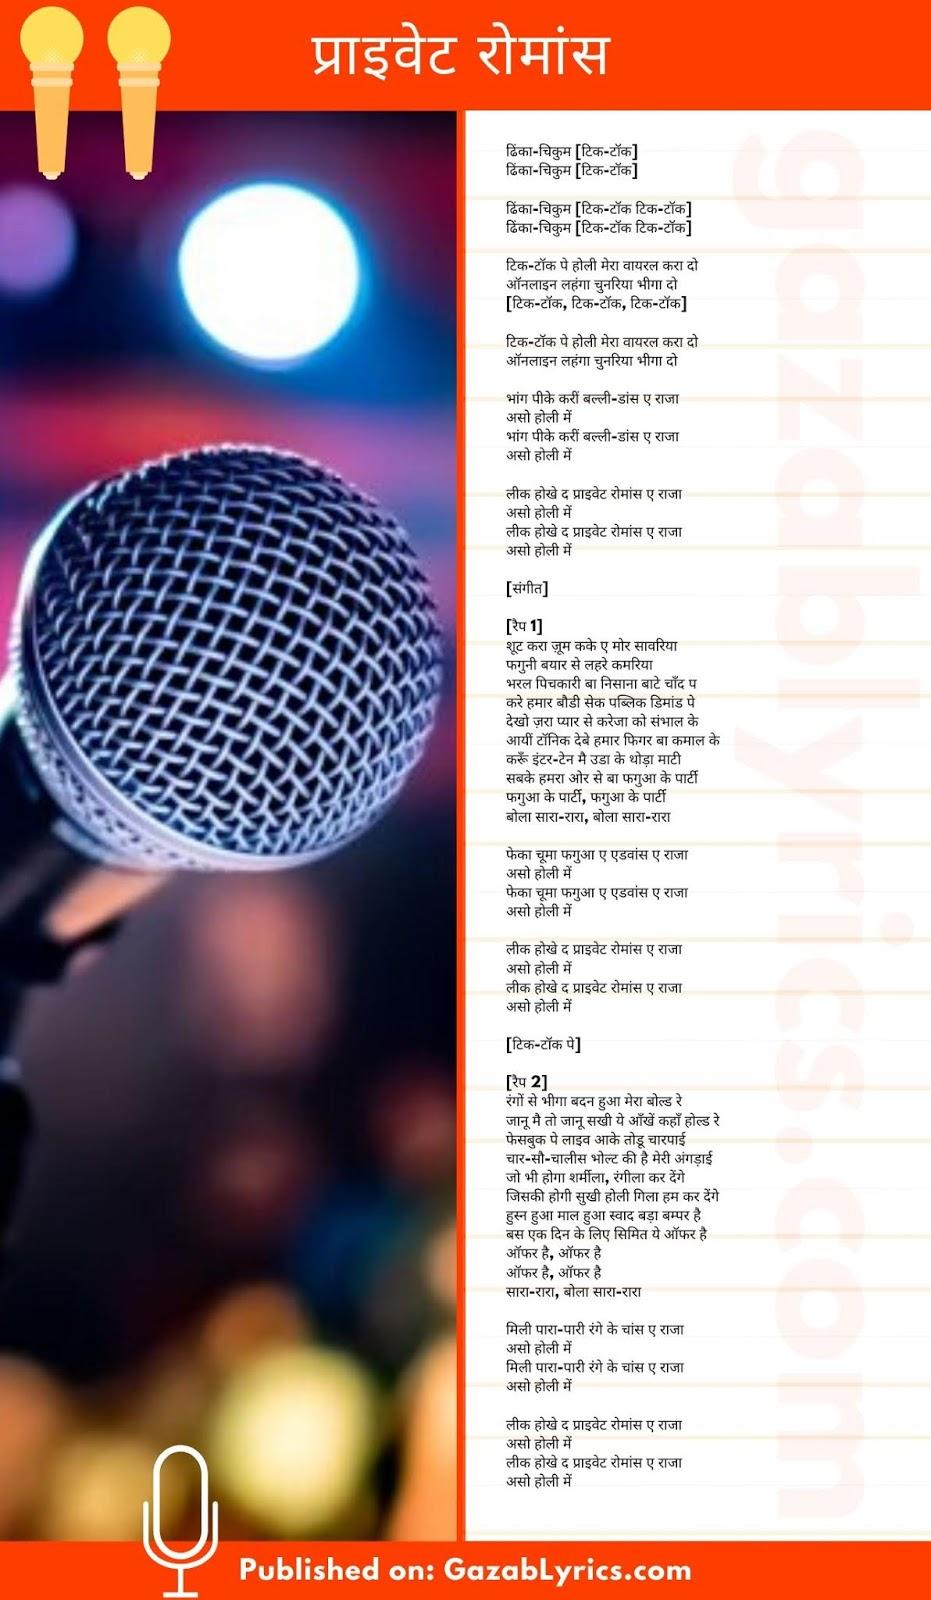 Private Romance song lyrics image